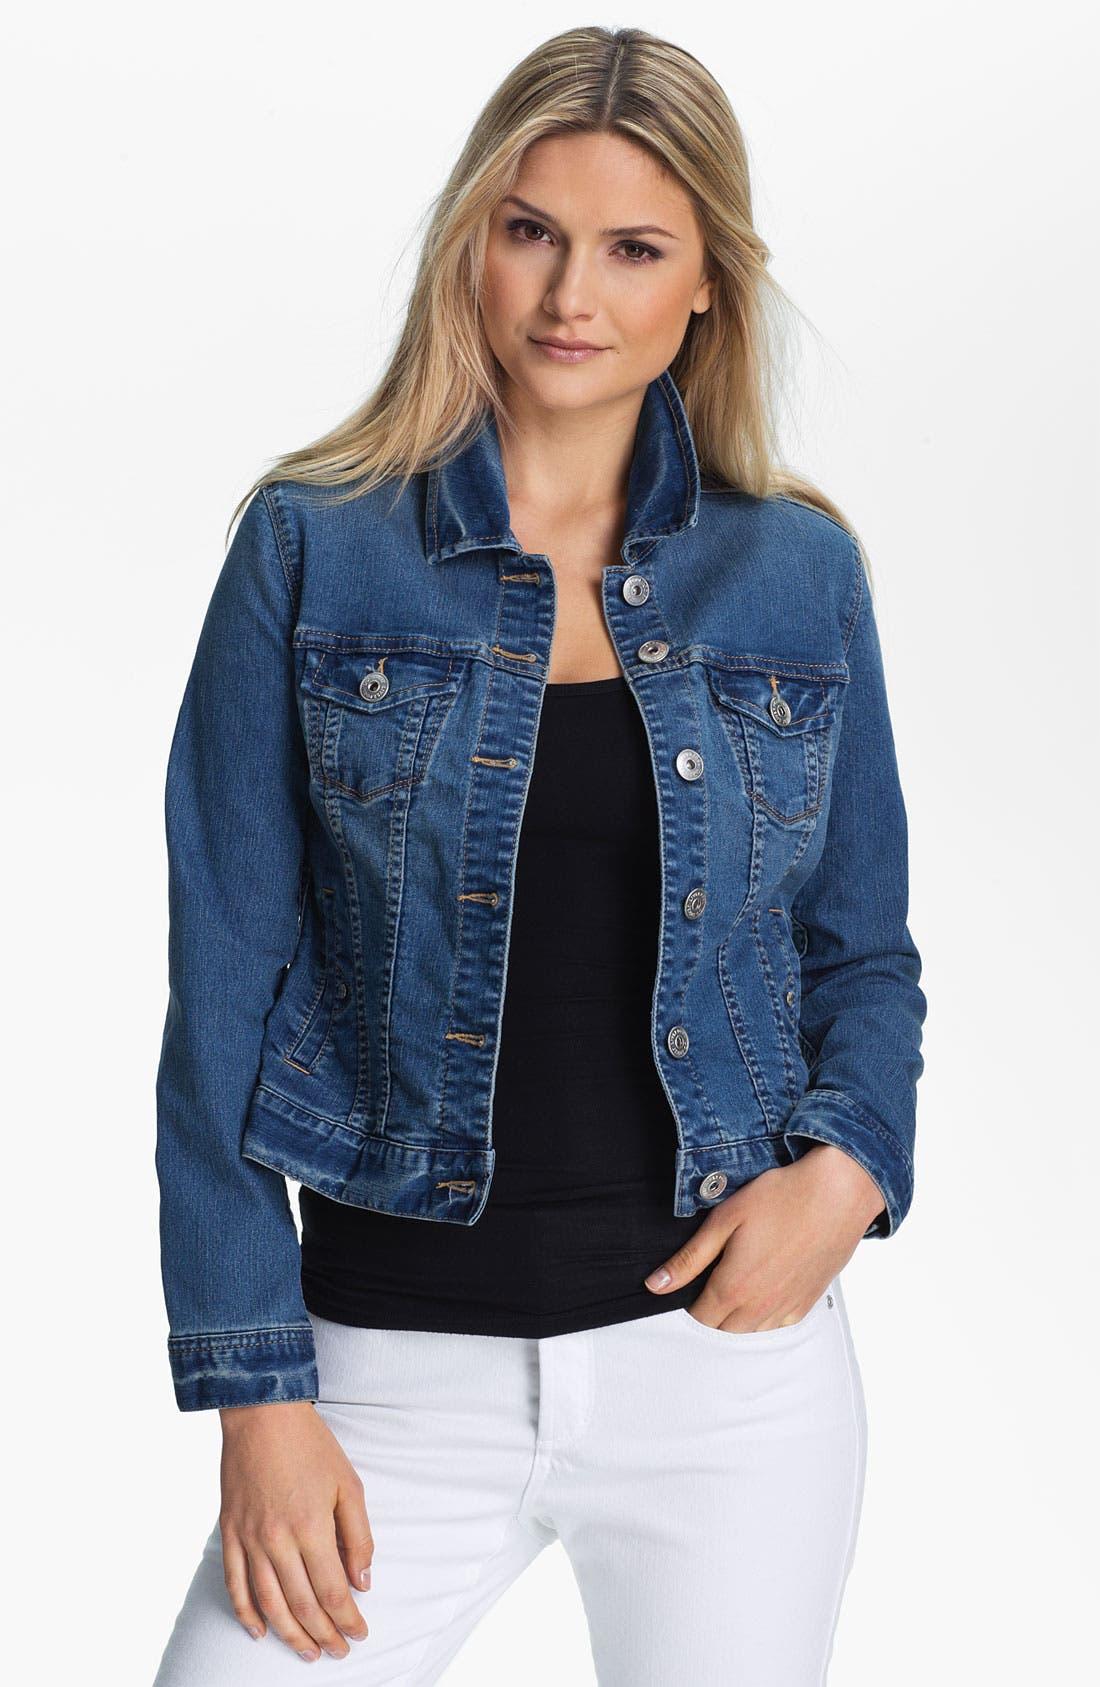 Main Image - Liverpool Jeans Company 'Blue Jay Way' Denim Jacket